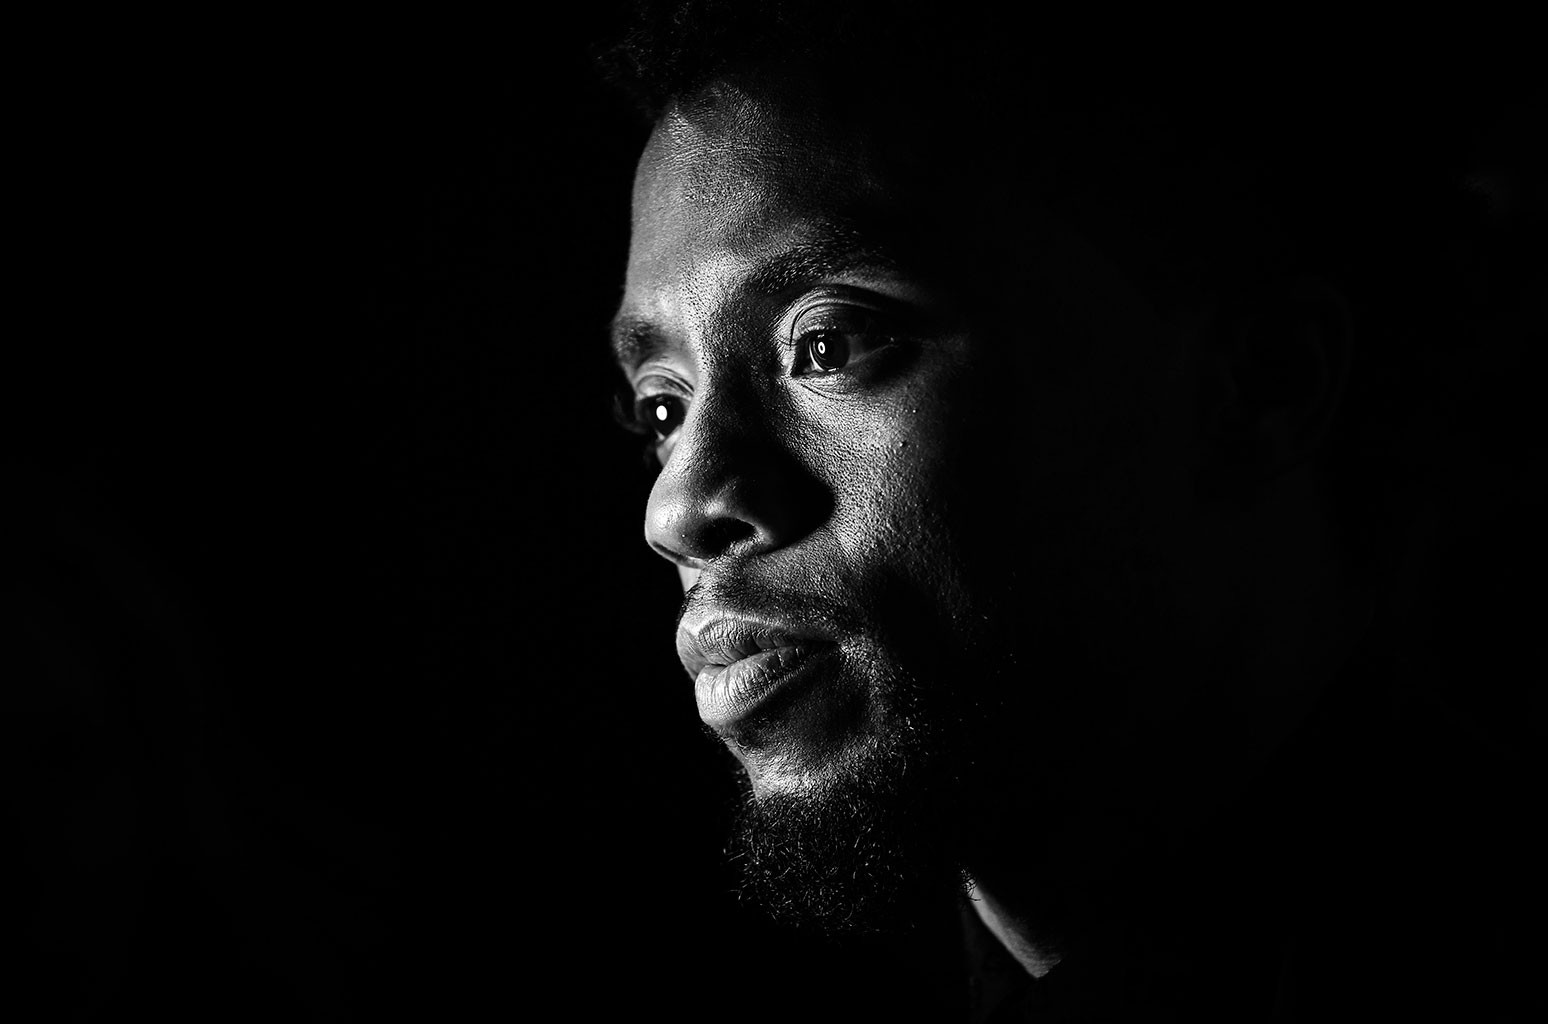 Black Panther Star Chadwick Boseman Posthumously Honored at MTV Movie & TV Awards Special 1 MUGIBSON WRITES